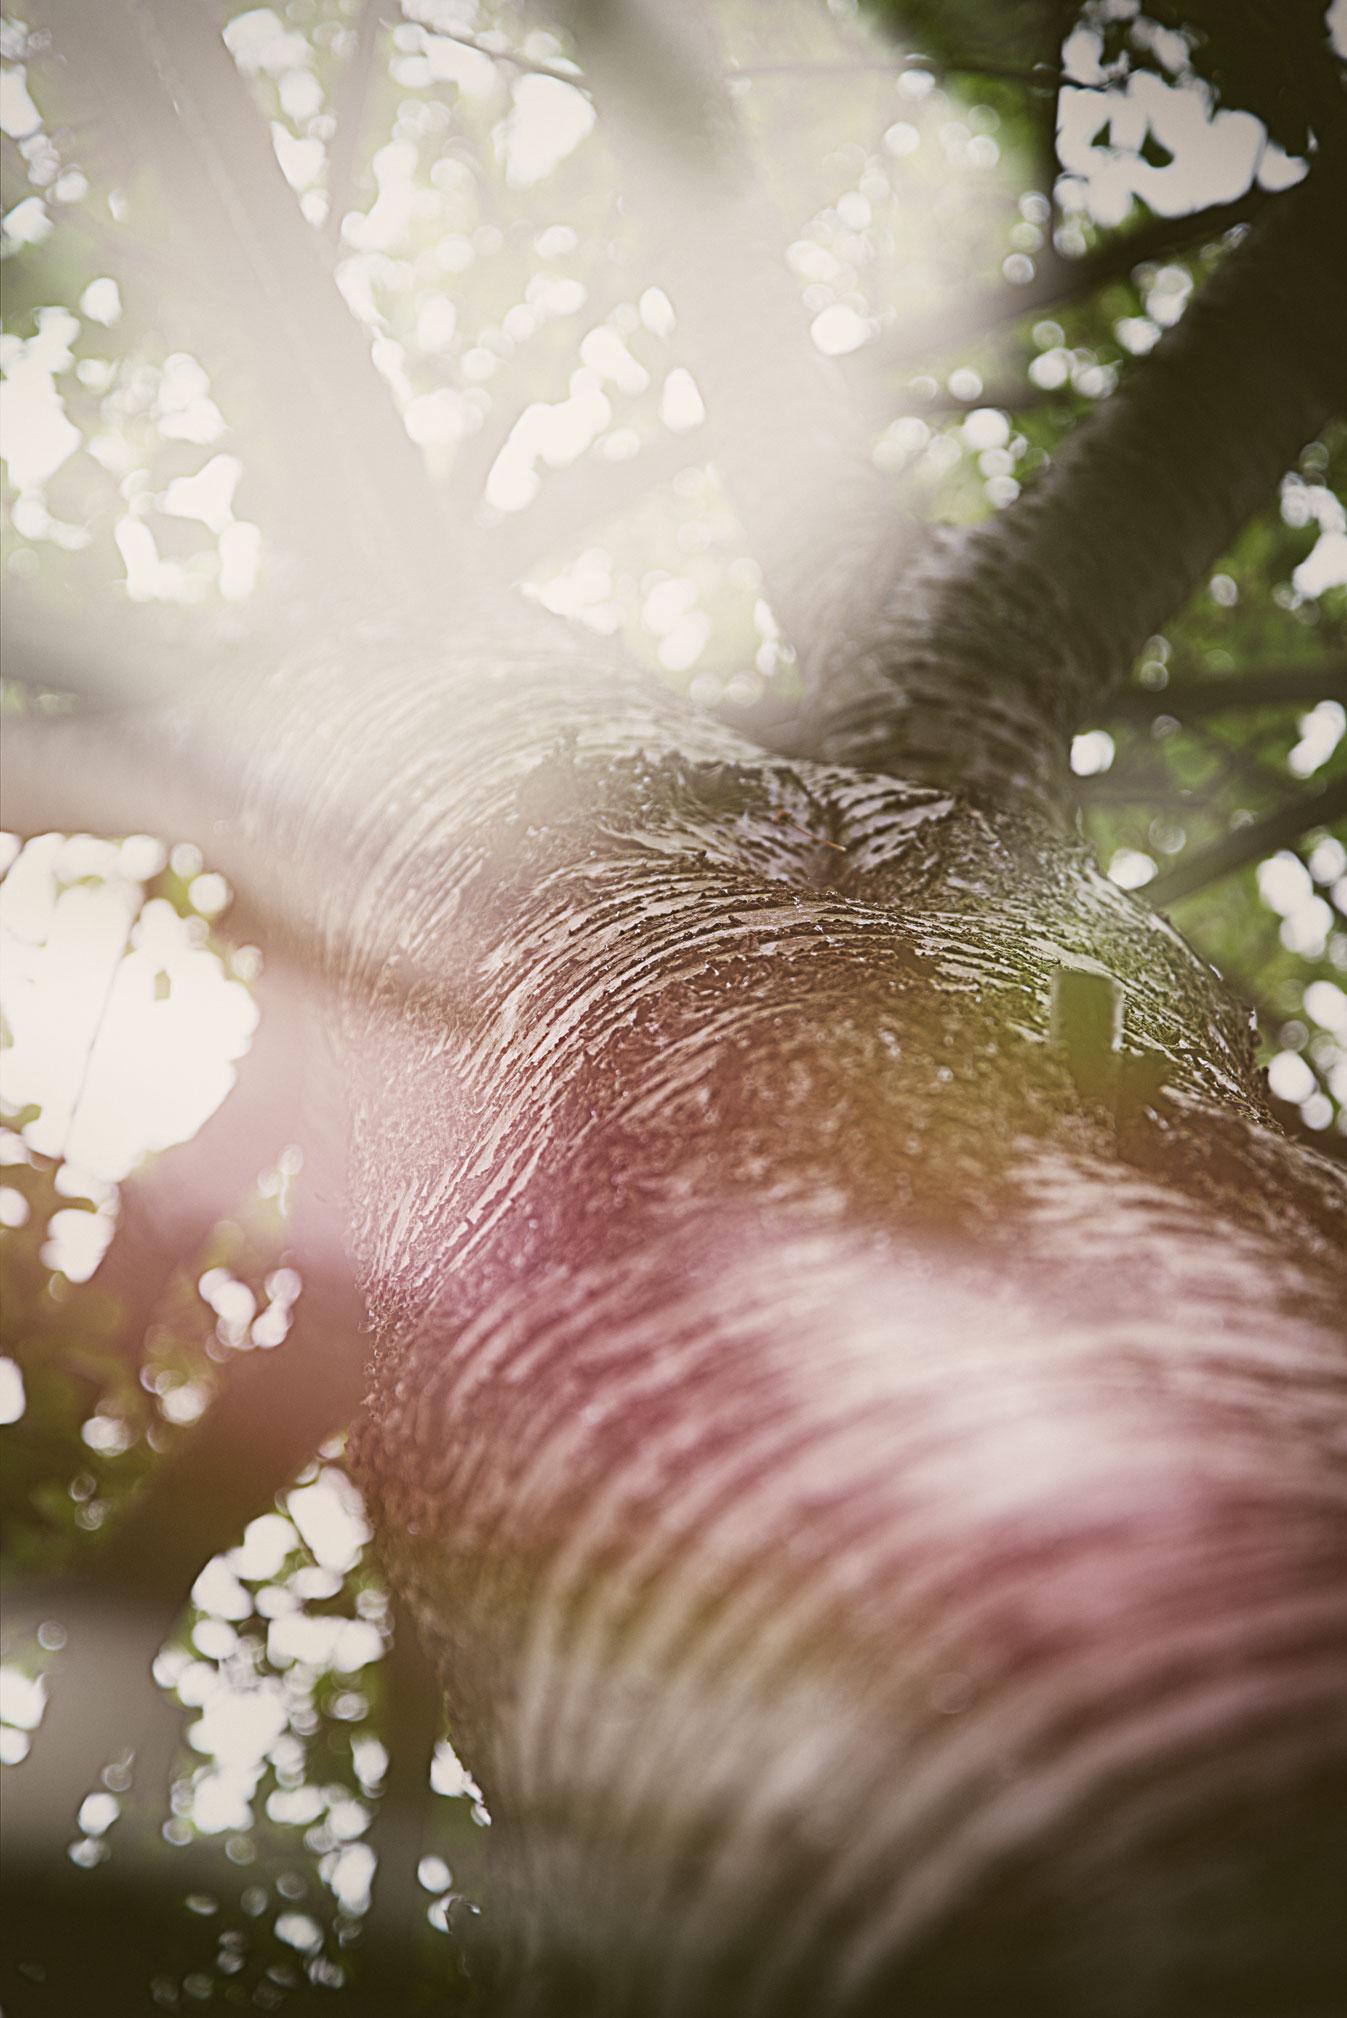 Its a Silver Birch Tree - Honest :)